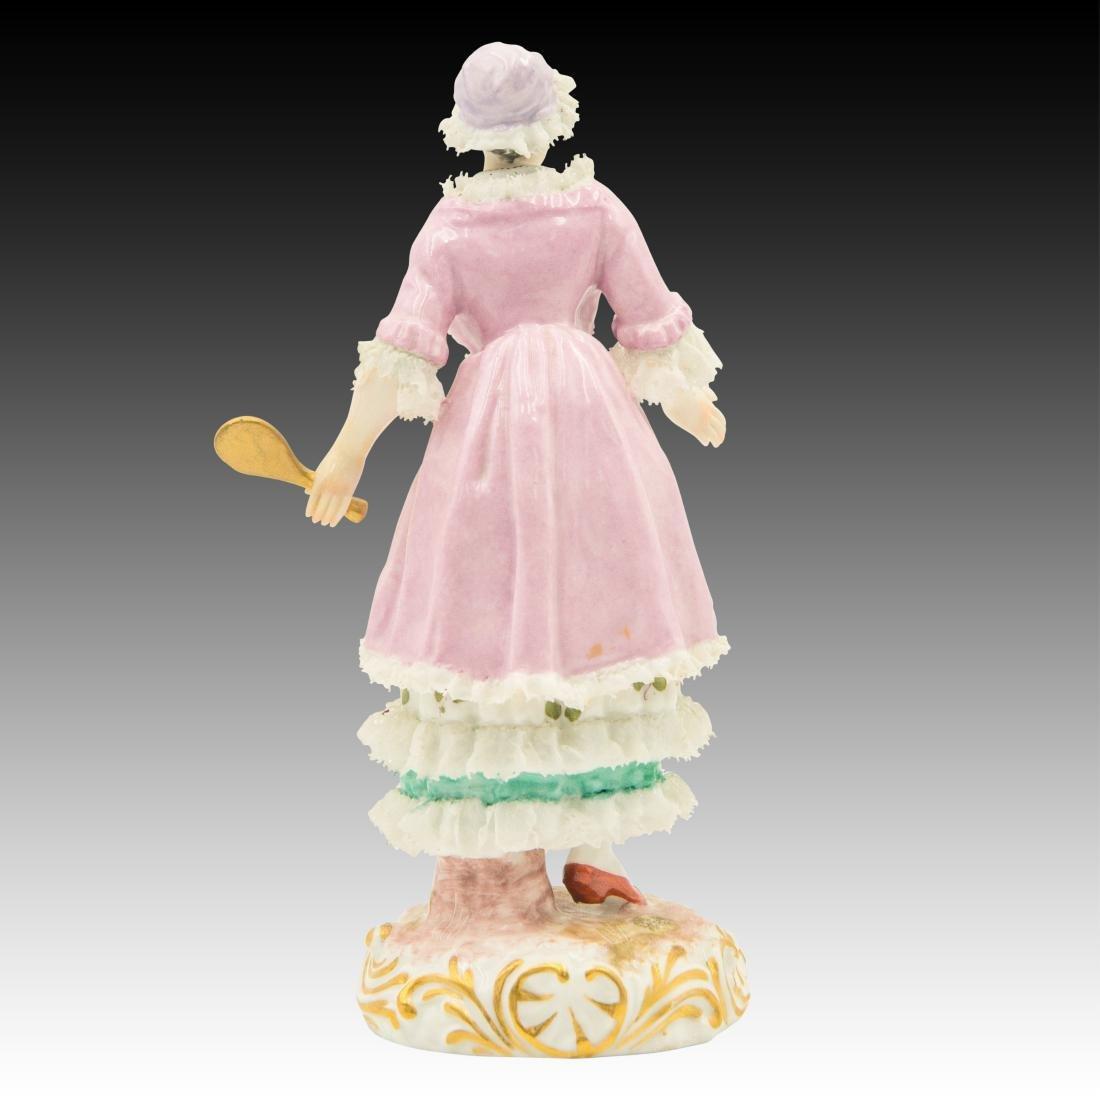 Meissen Maiden Wearing a Lace Dress Figurine - 3